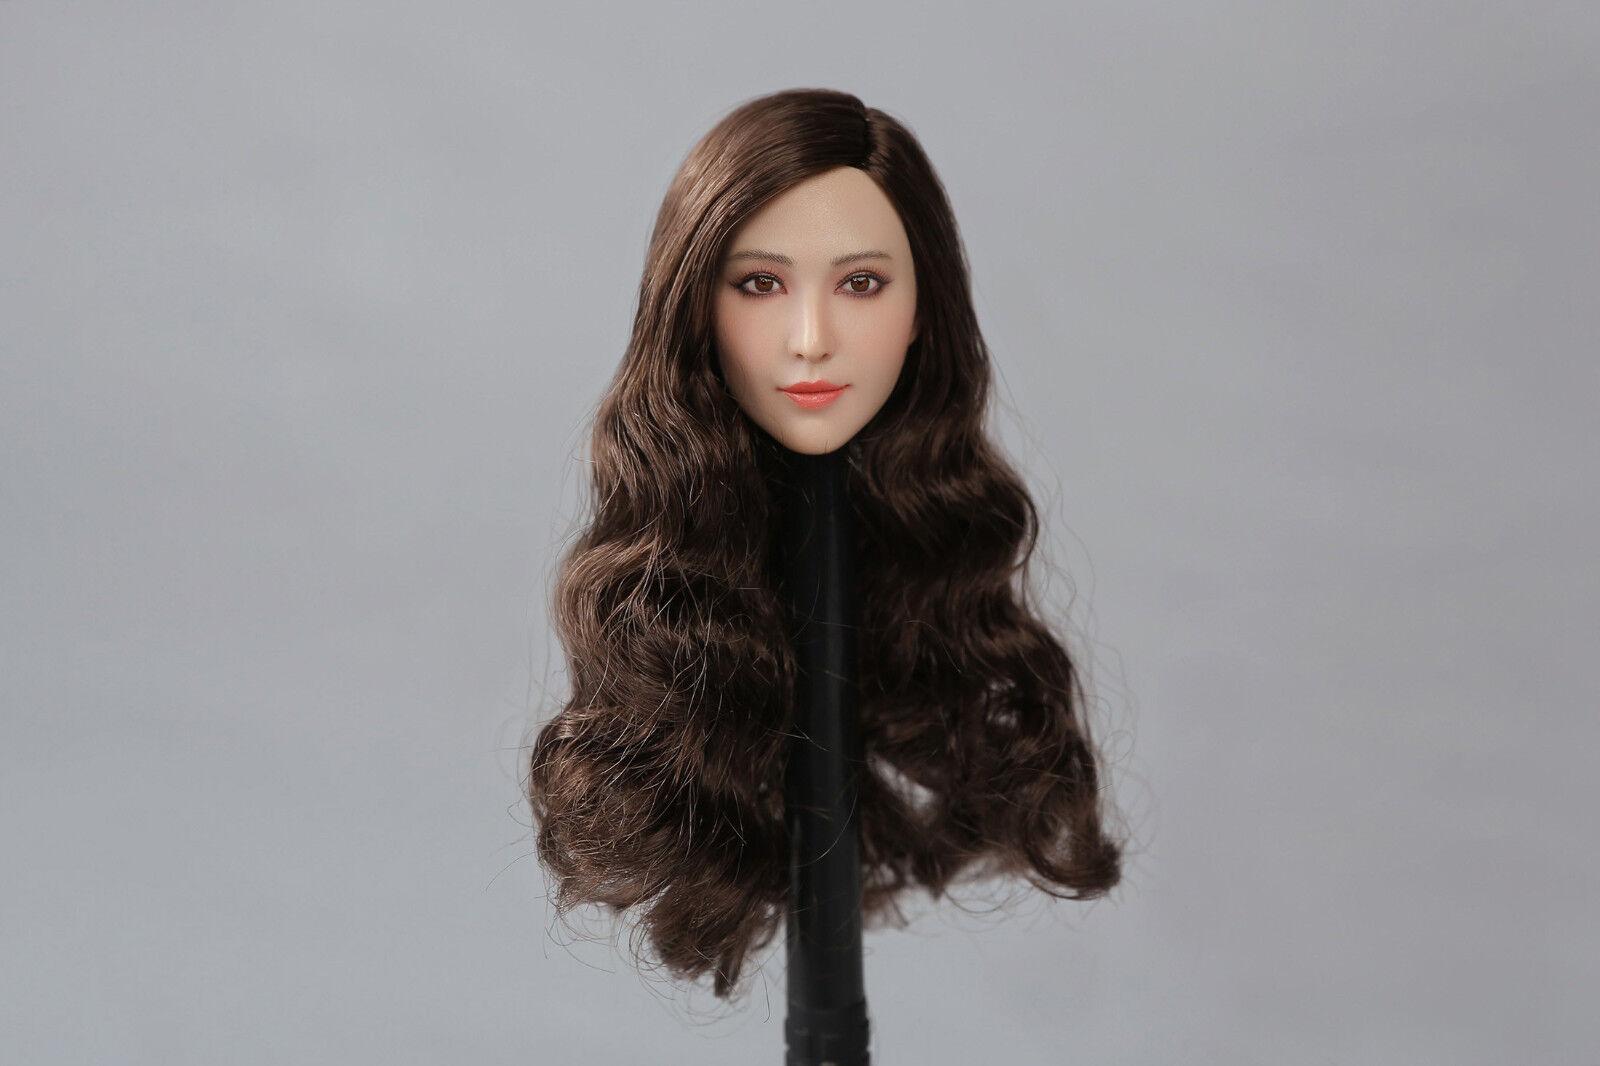 Peak Toys 1 6 Scale Asian beauty star headsculpt PT003